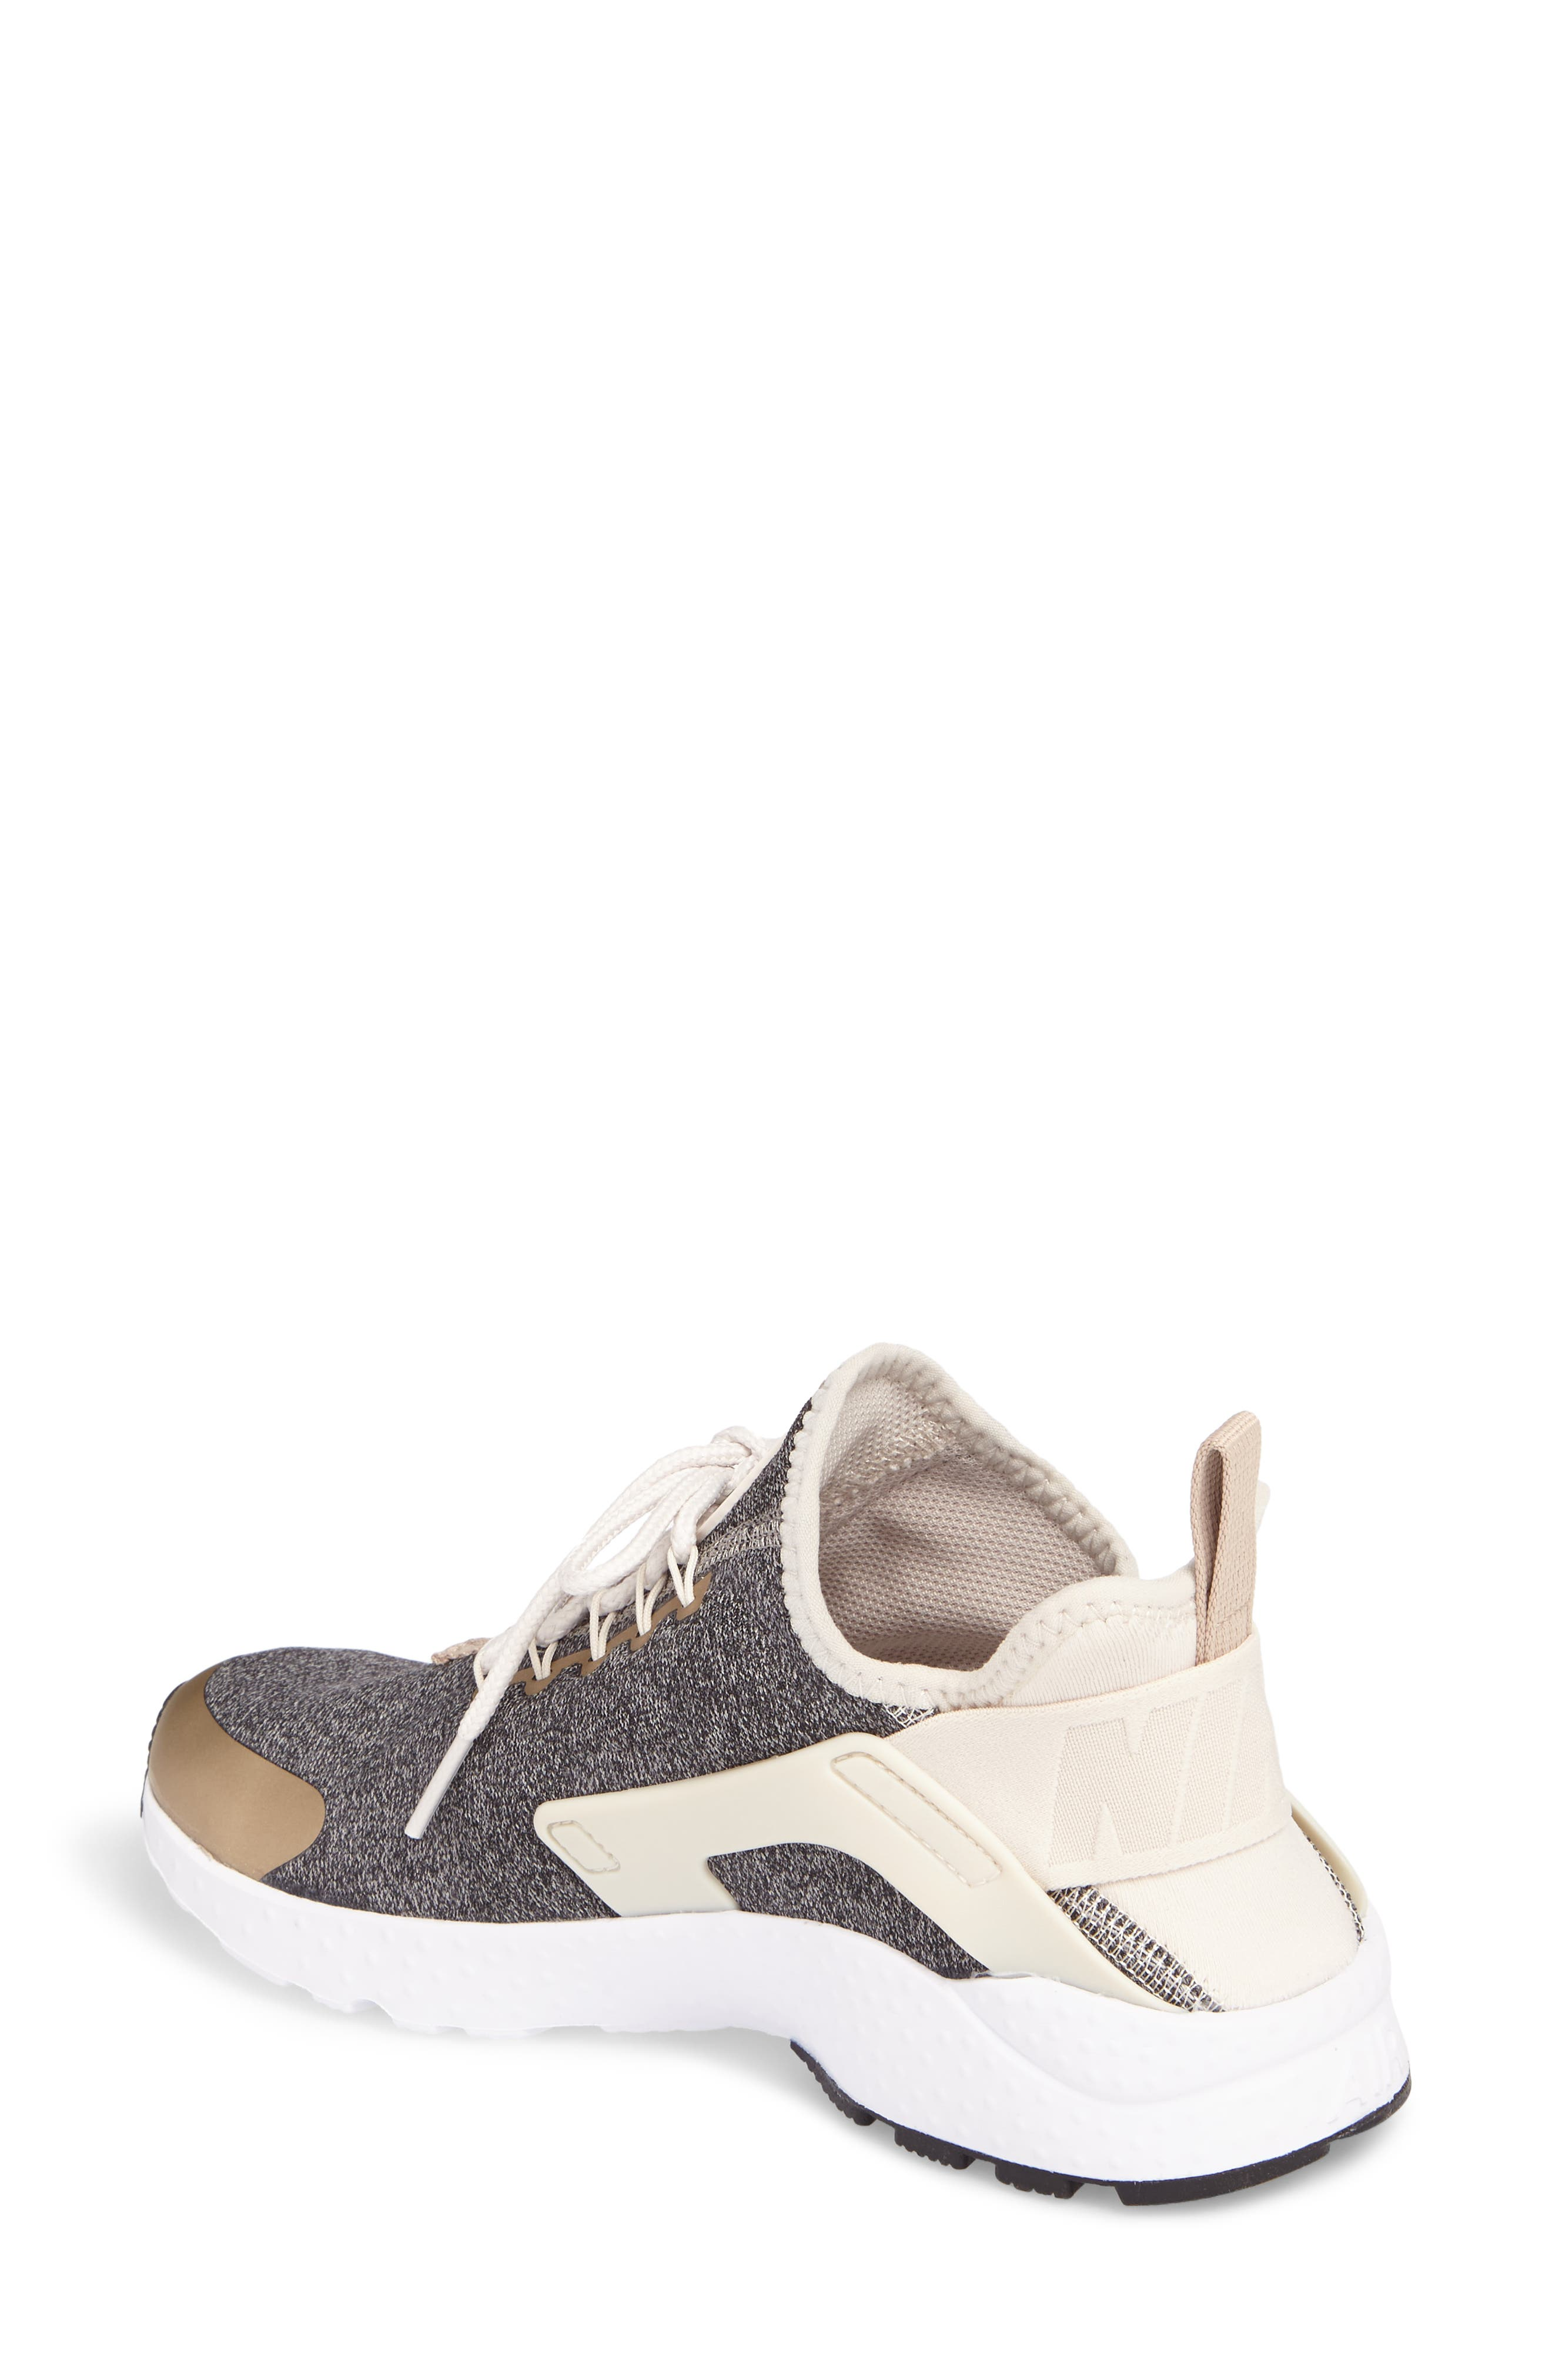 NIKE,                             'Air Huarache Run Ultra SE' Sneaker,                             Alternate thumbnail 2, color,                             285